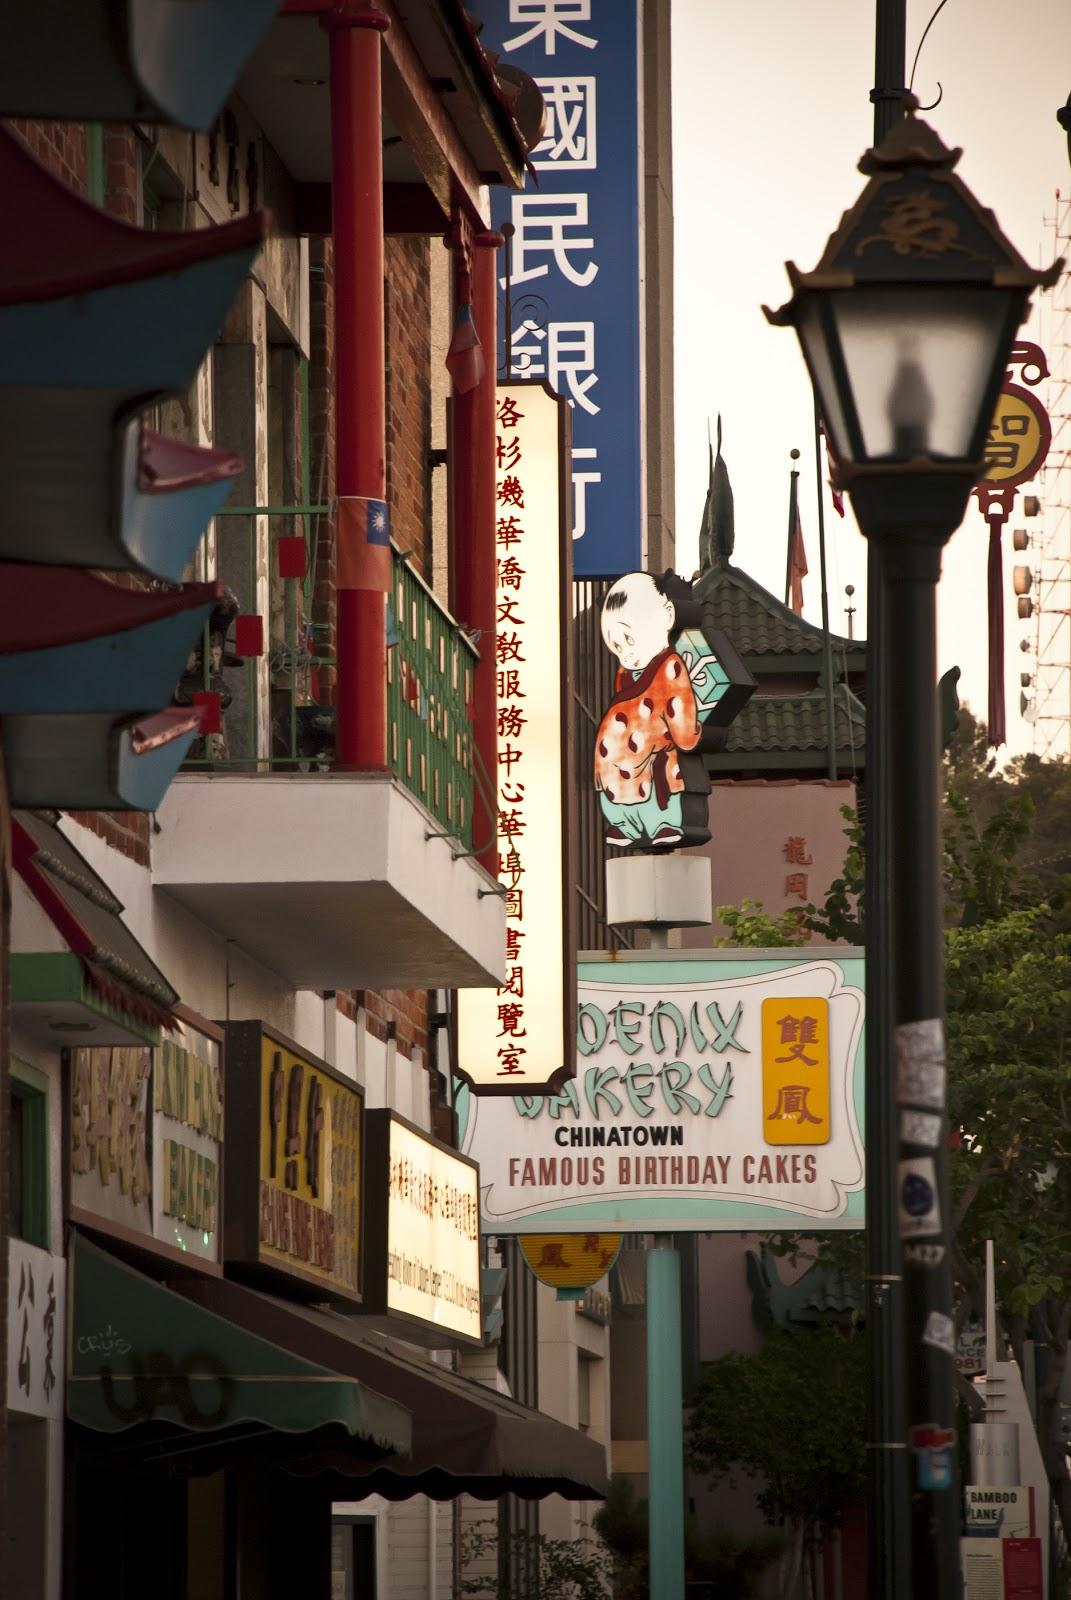 Phantom Los Angeles Chinatown Los Angeles